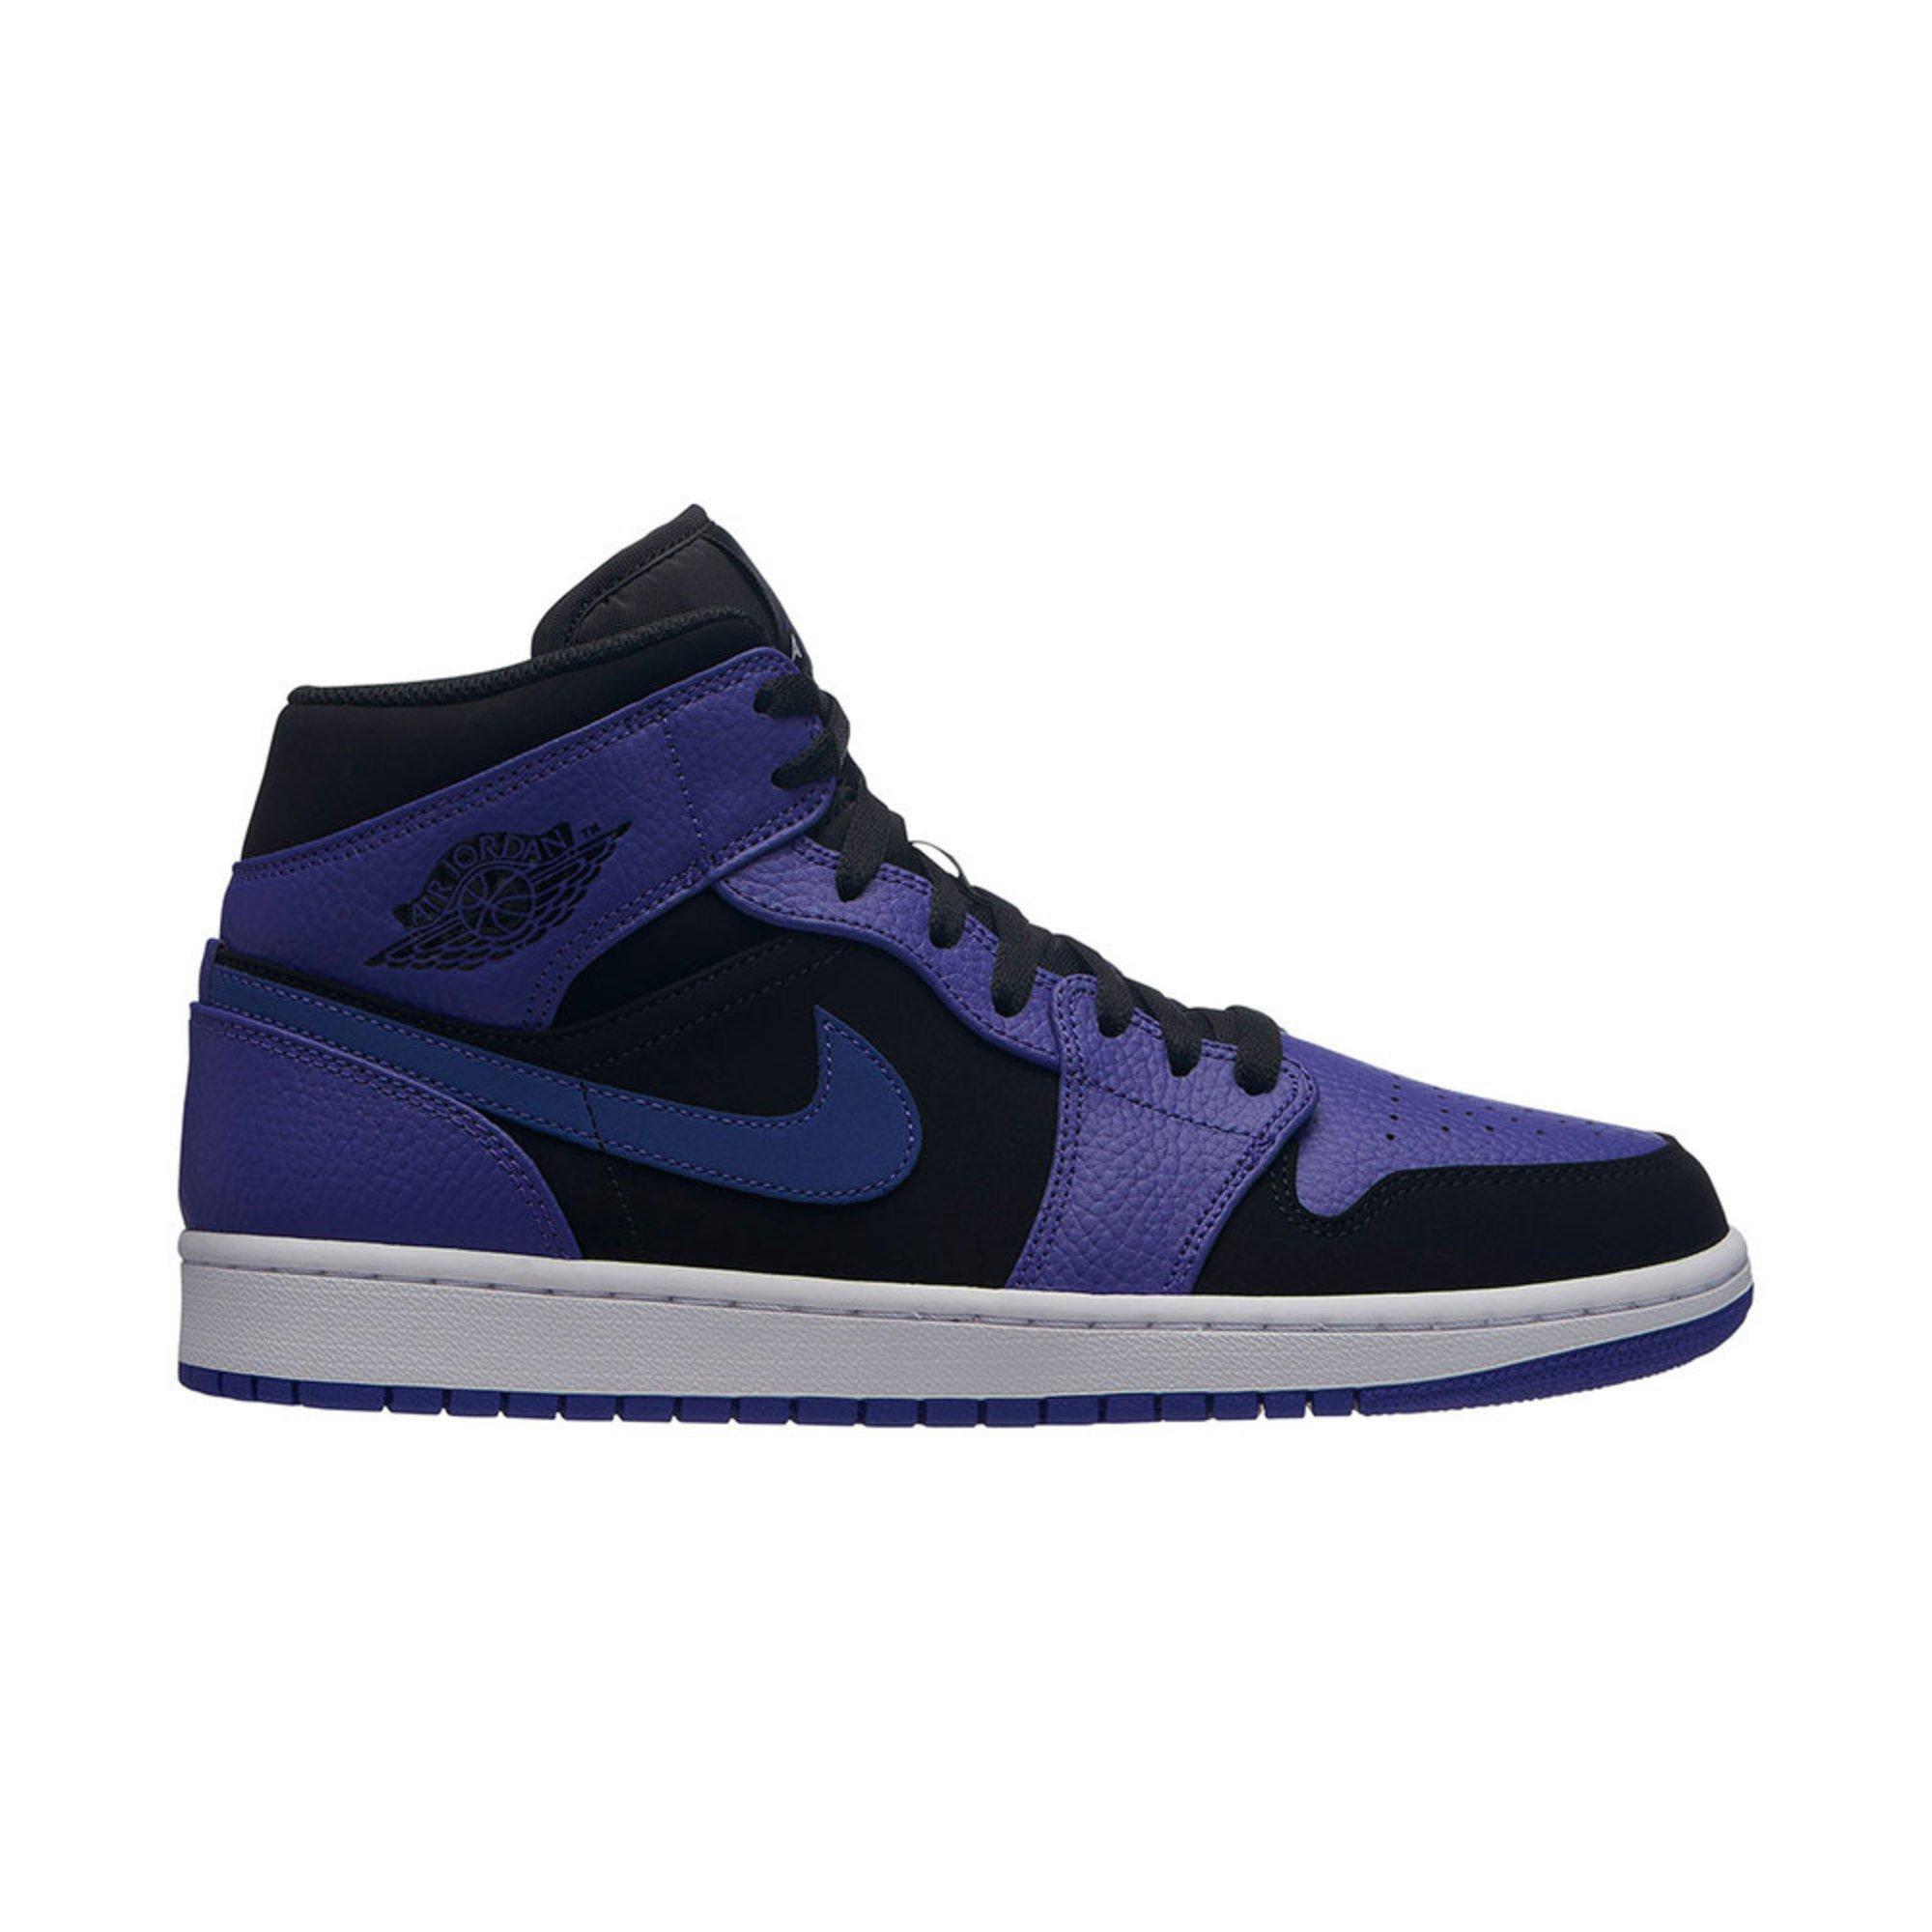 new arrival 8b24f afb54 Jordan. Jordan Men s Air Jordan 1 Mid Basketball Shoe